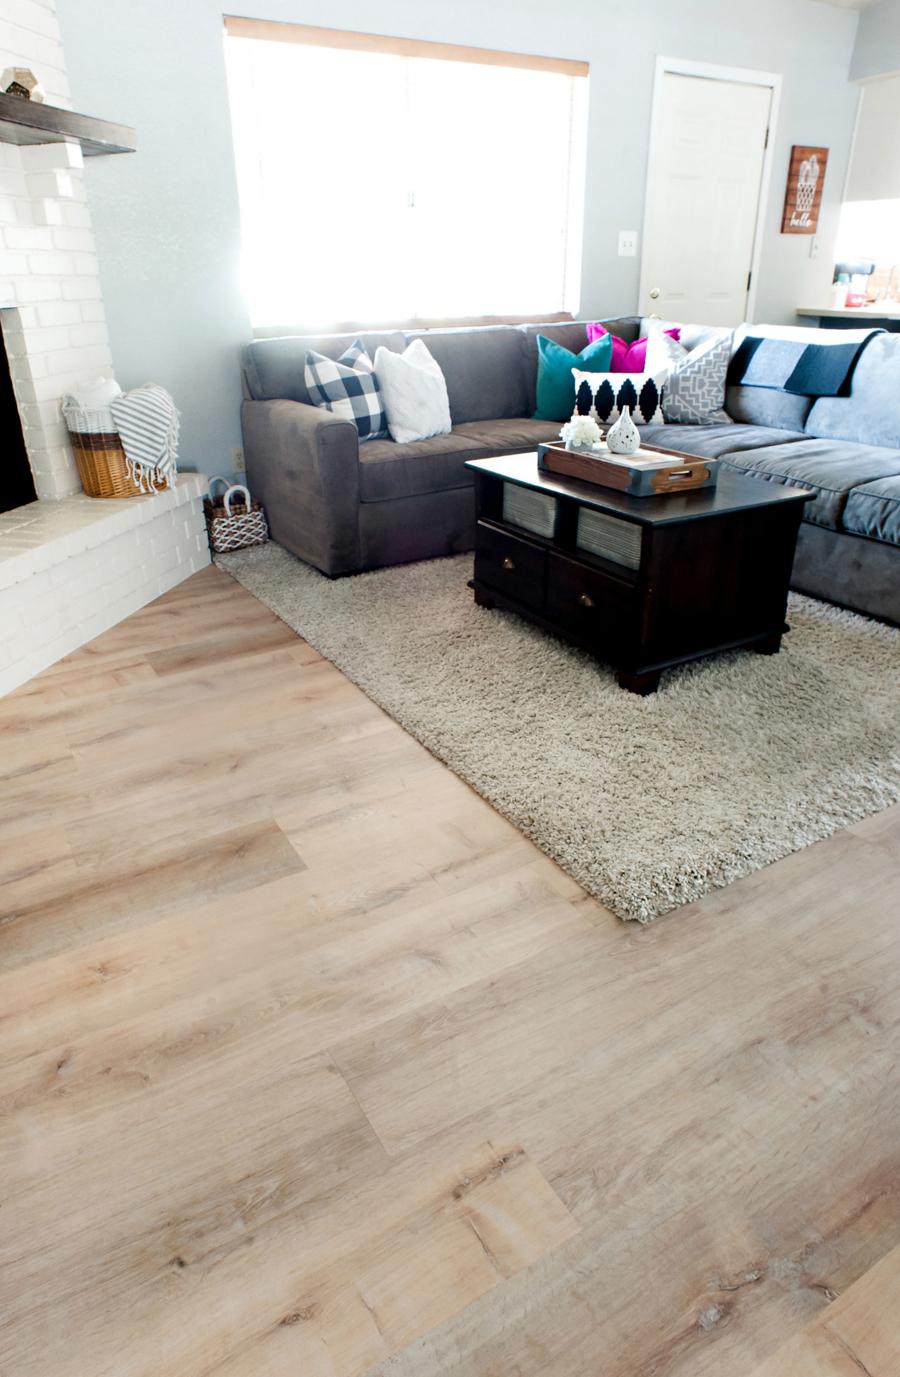 Wood Look Vinyl Plank Flooring From Allure - What to look for in vinyl plank flooring